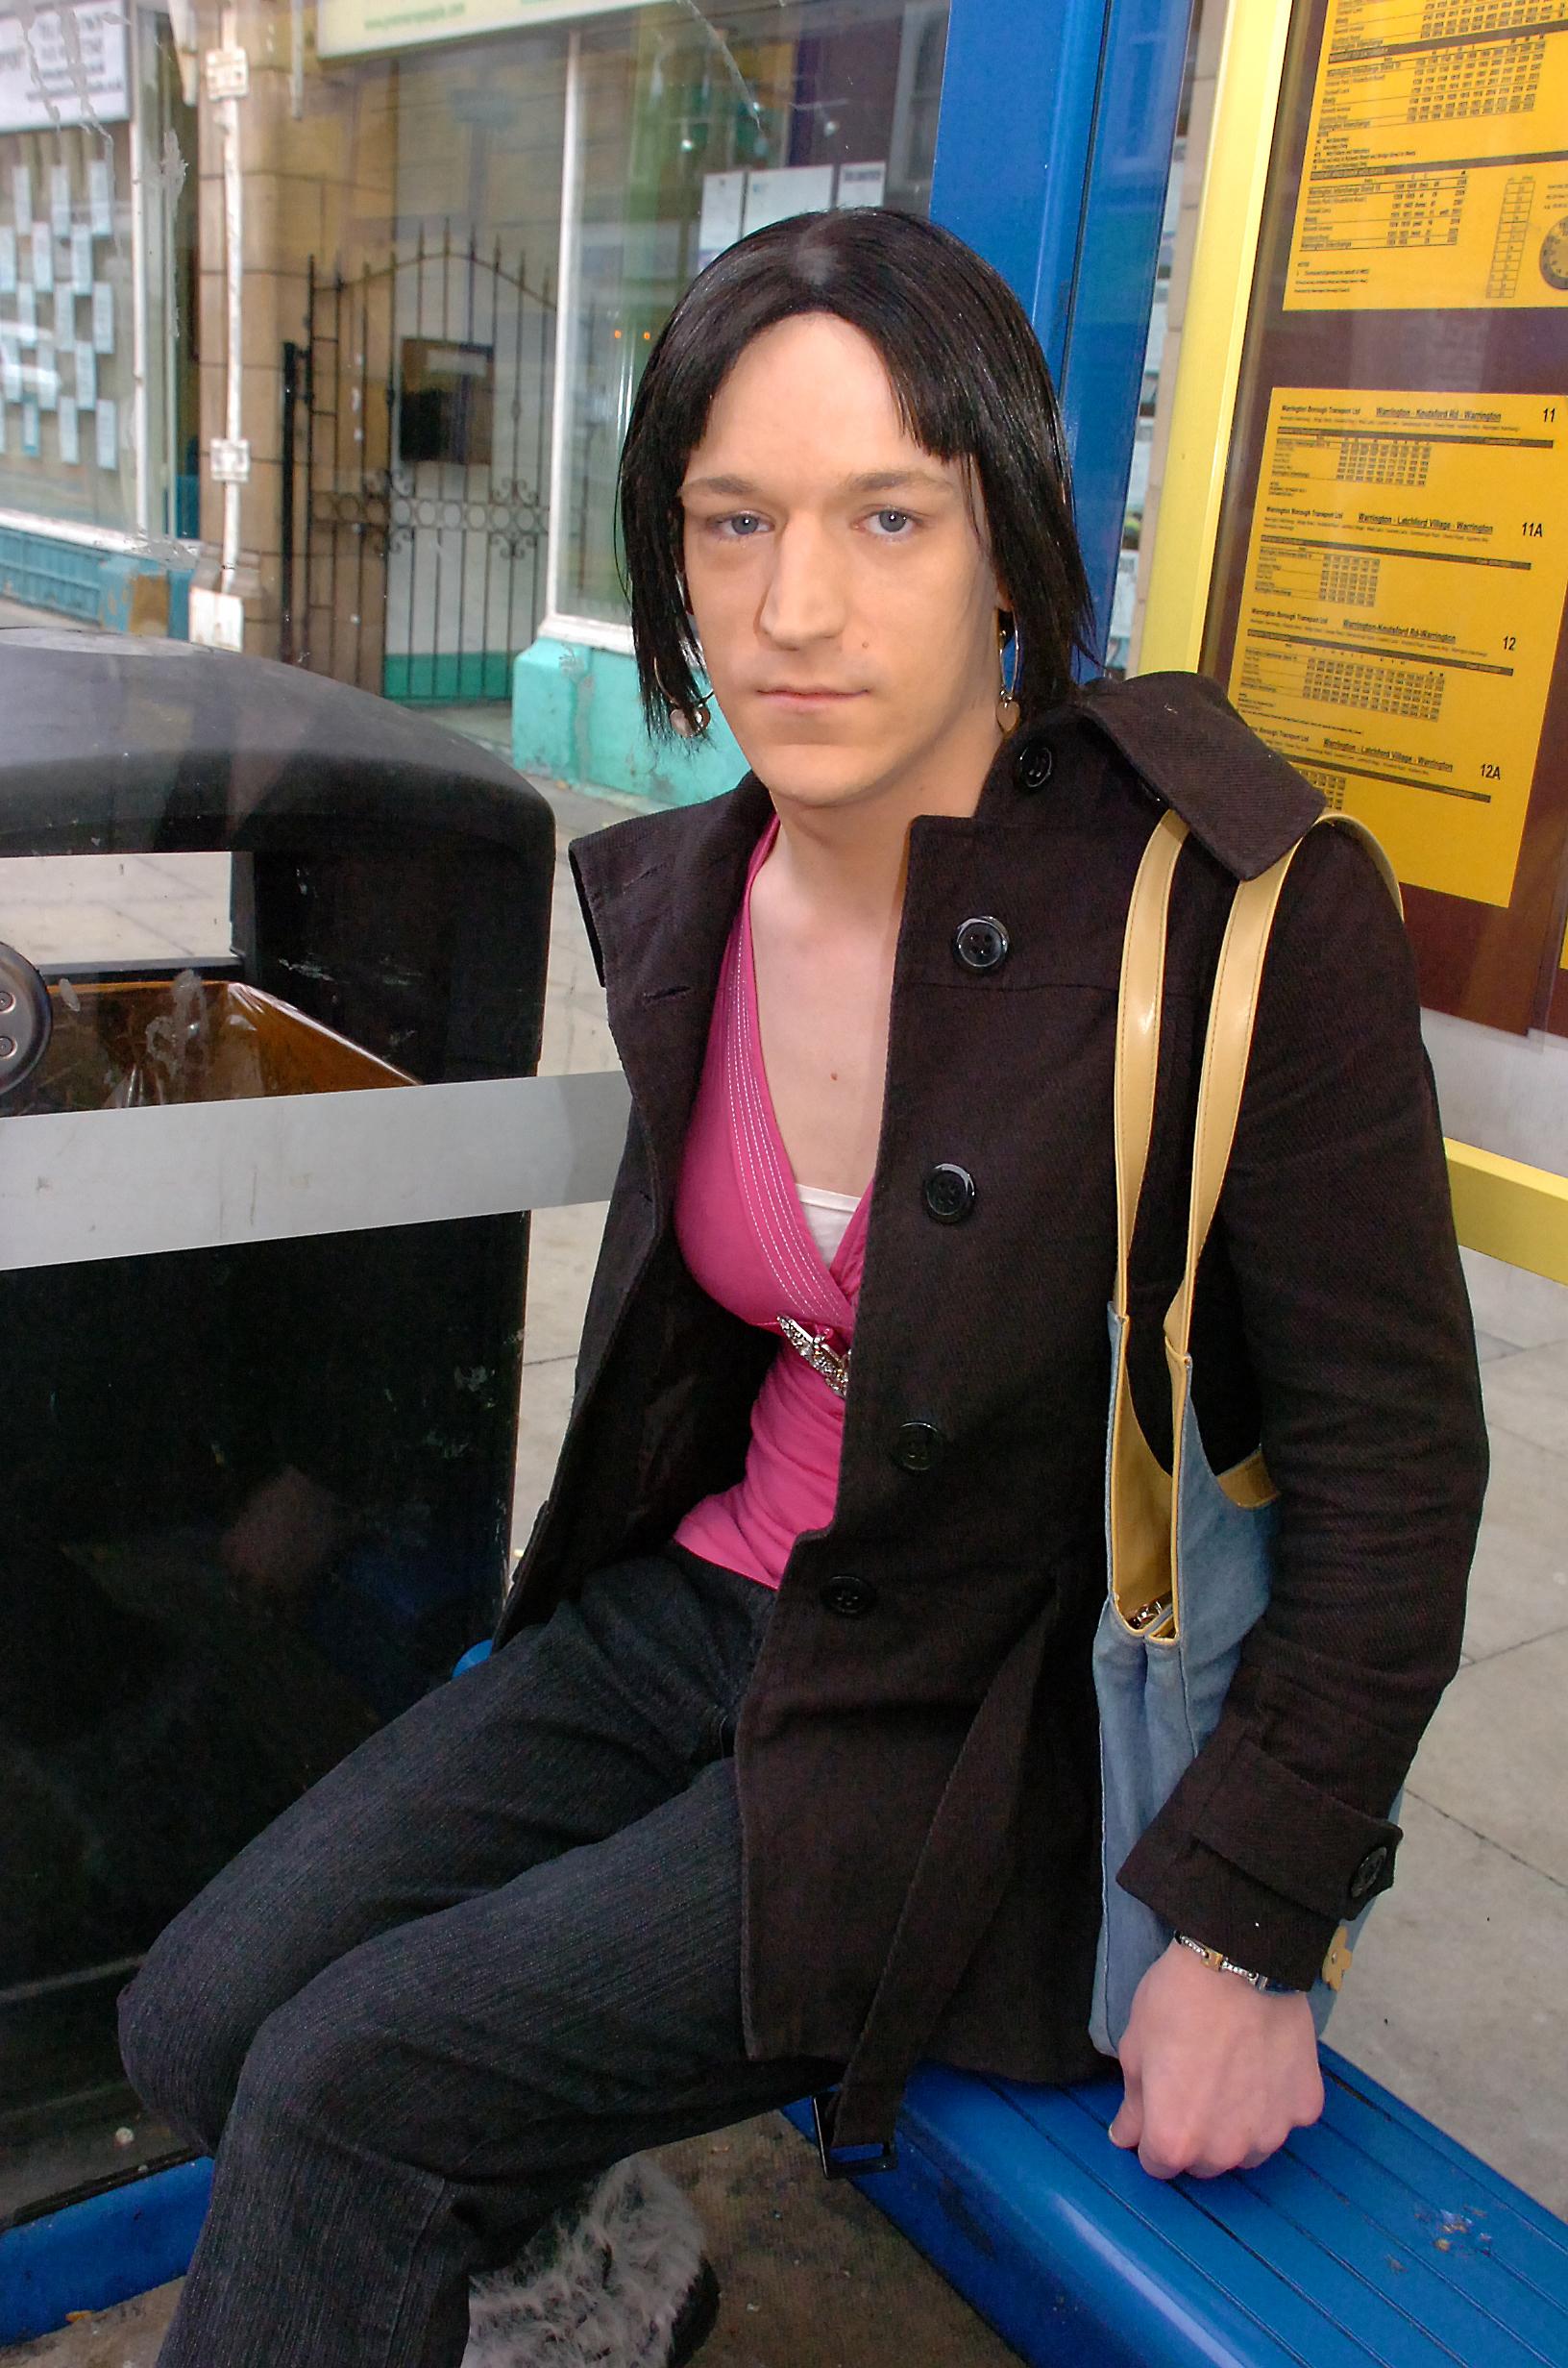 Transsexual northwest uk